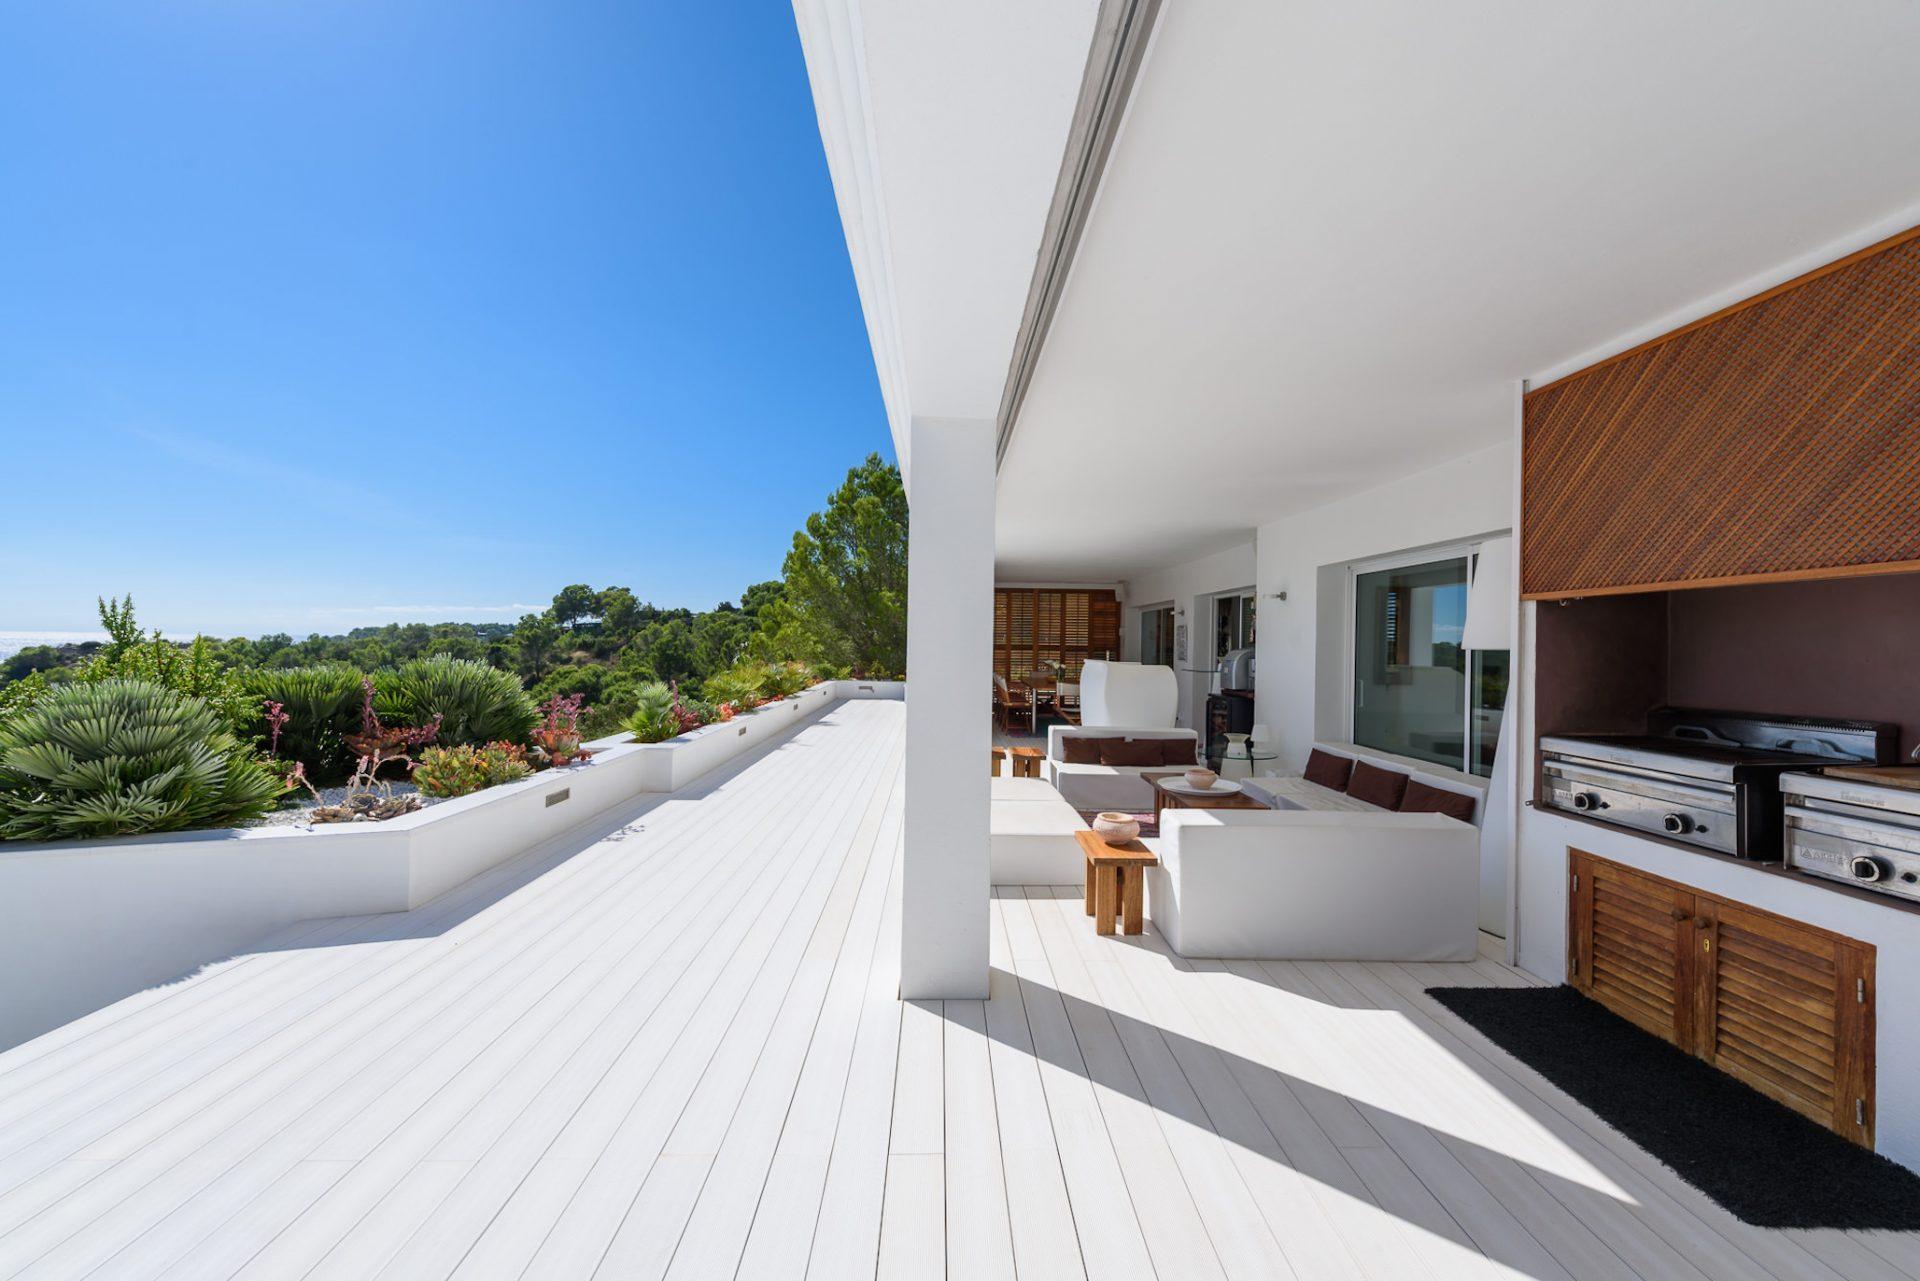 Casa Blanca Jondal Hq19